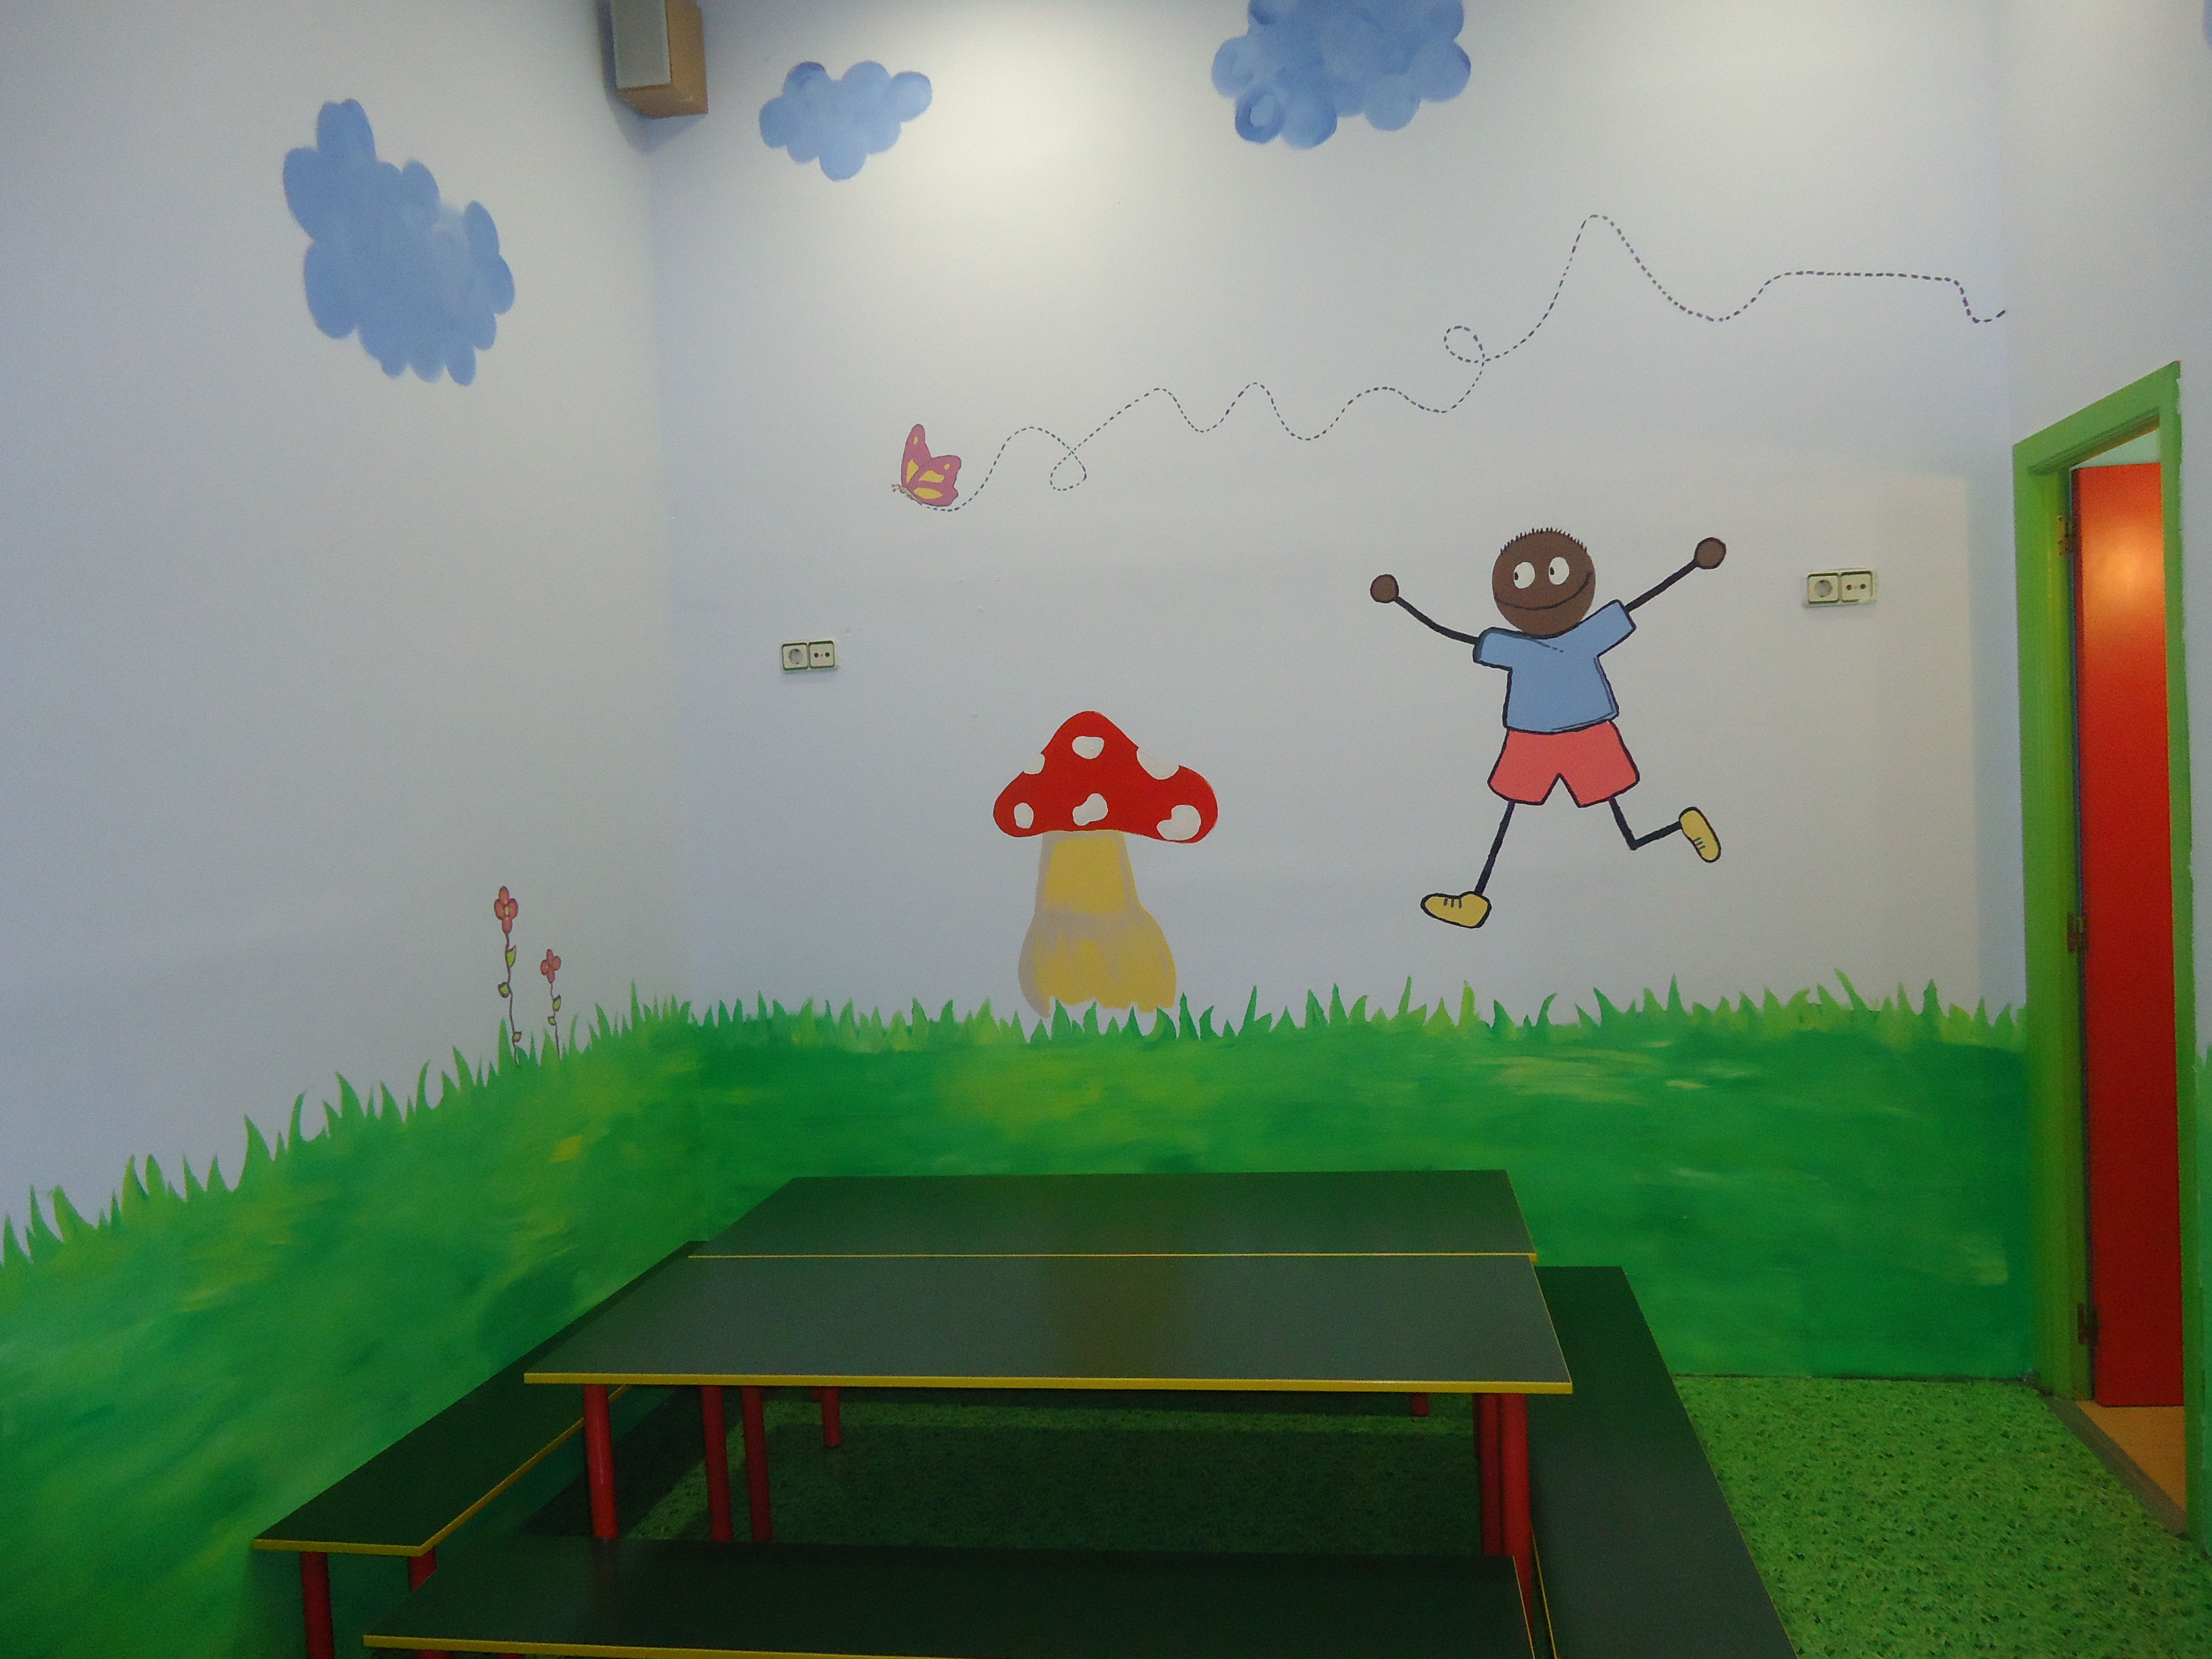 Foto 23 de Parques infantiles en Móstoles | Gnomos y Hobbits